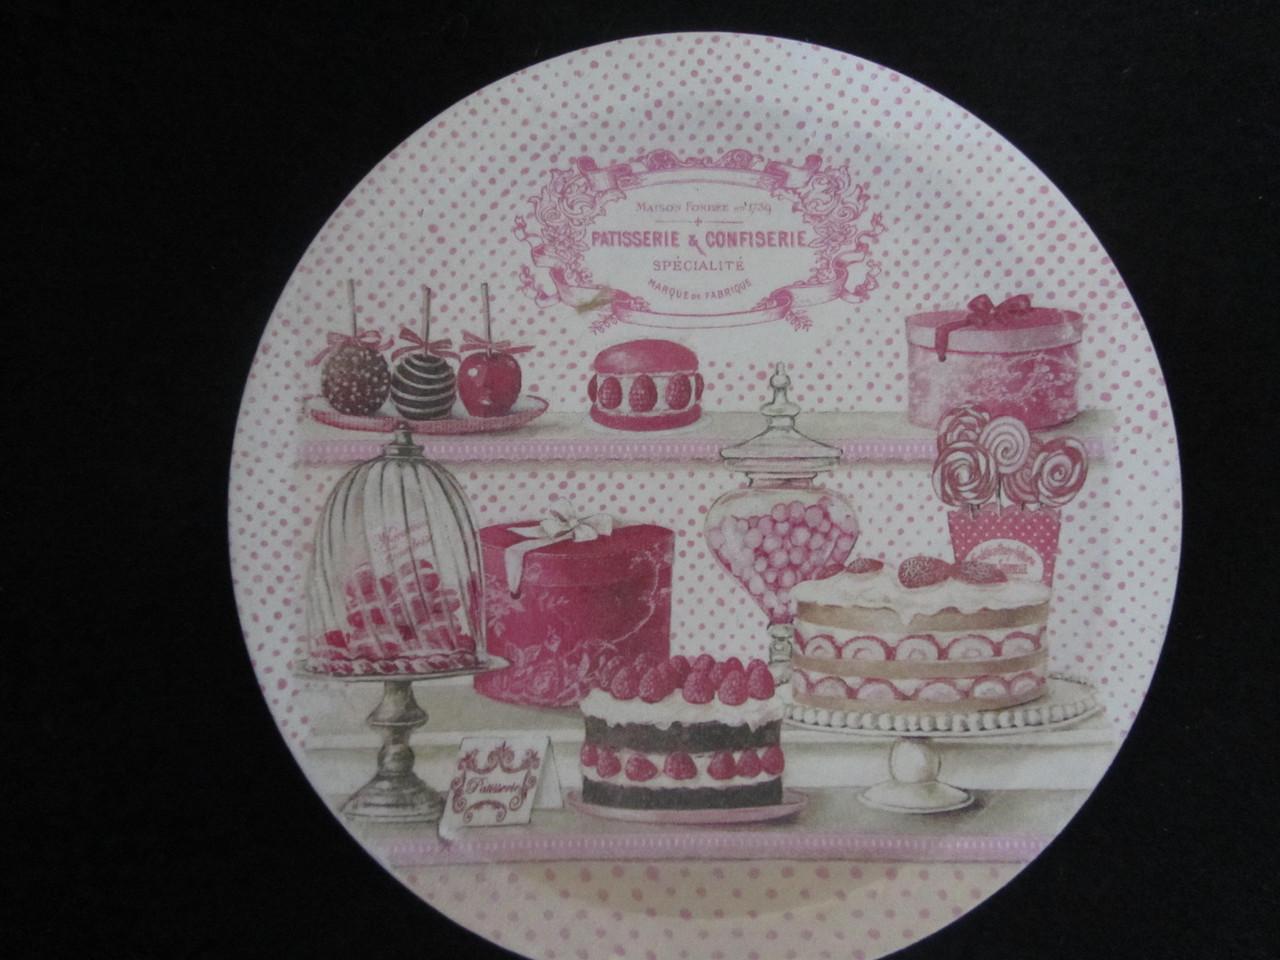 Тарелка деревянная с тематическими рисунками, d-18 см, 90\80 (цена за 1 шт.+10 грн)